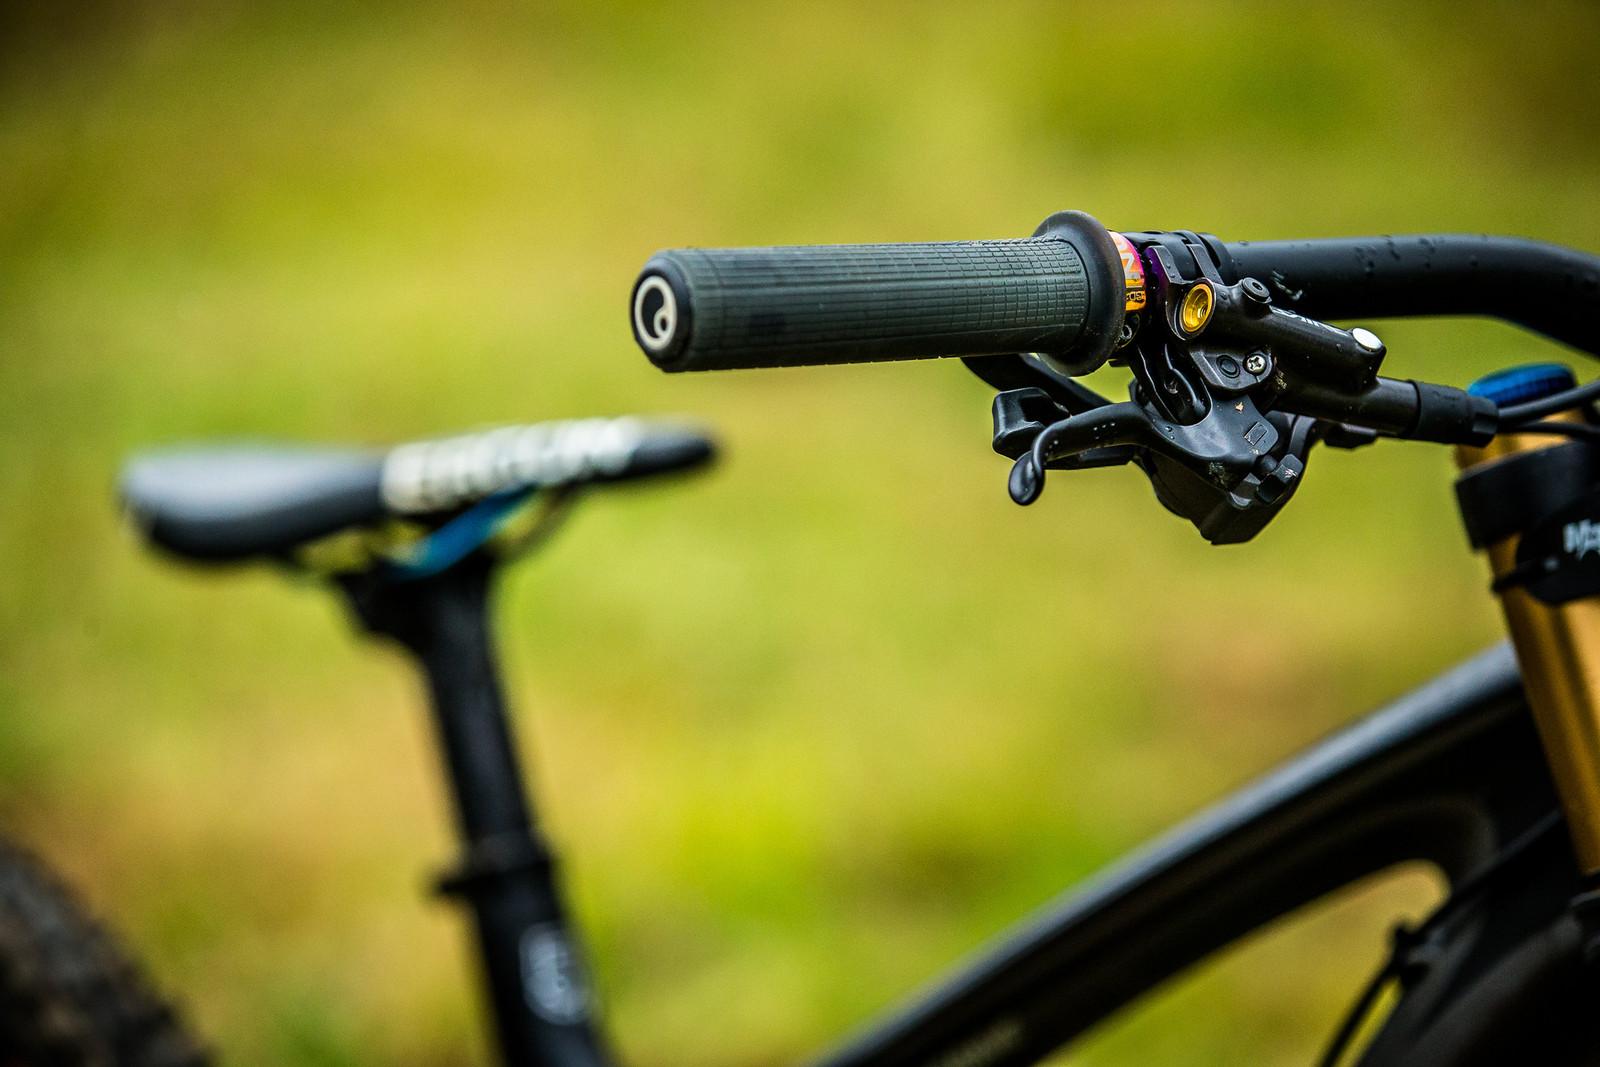 Ergon GD1 MTB Gravity Grips - WINNING BIKE: Tahnee Seagrave's Transition TR11 - Mountain Biking Pictures - Vital MTB